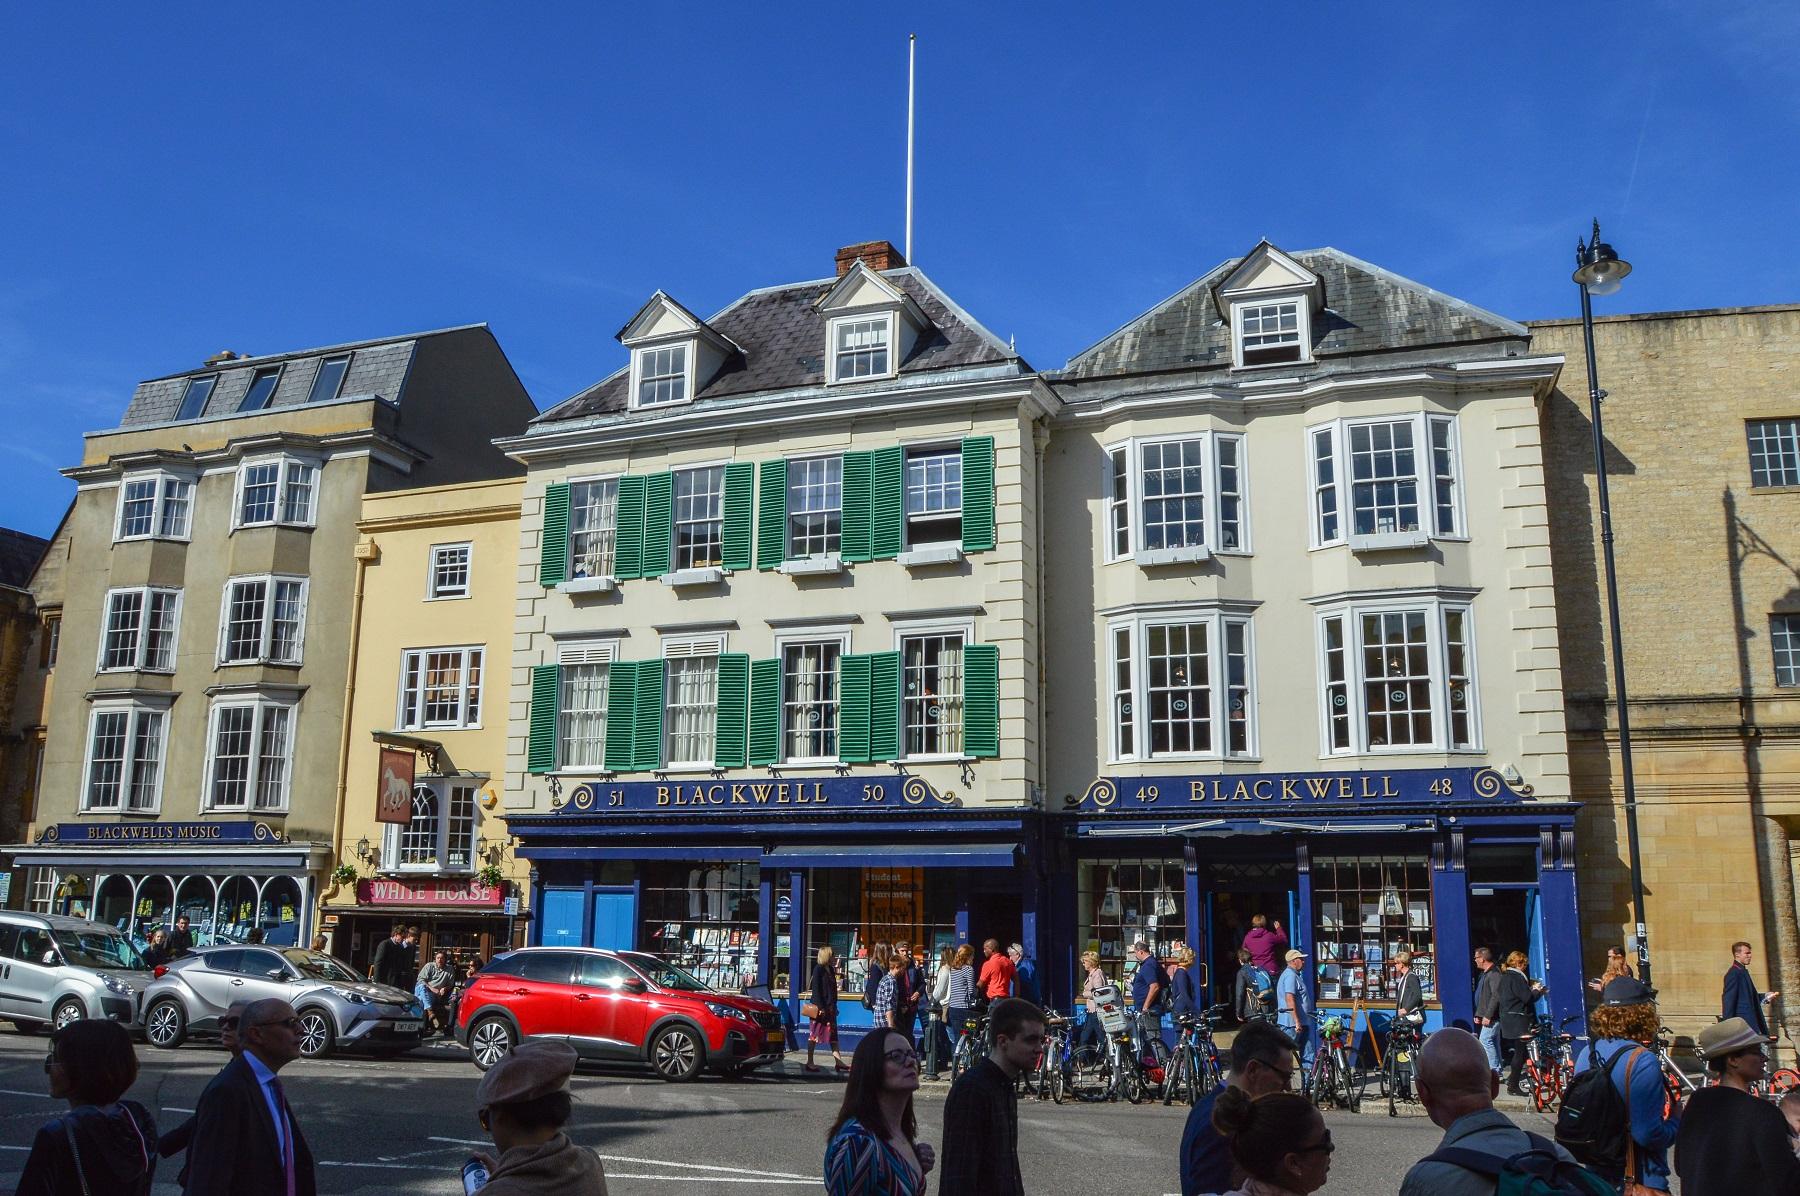 Ulica-w-Oxford